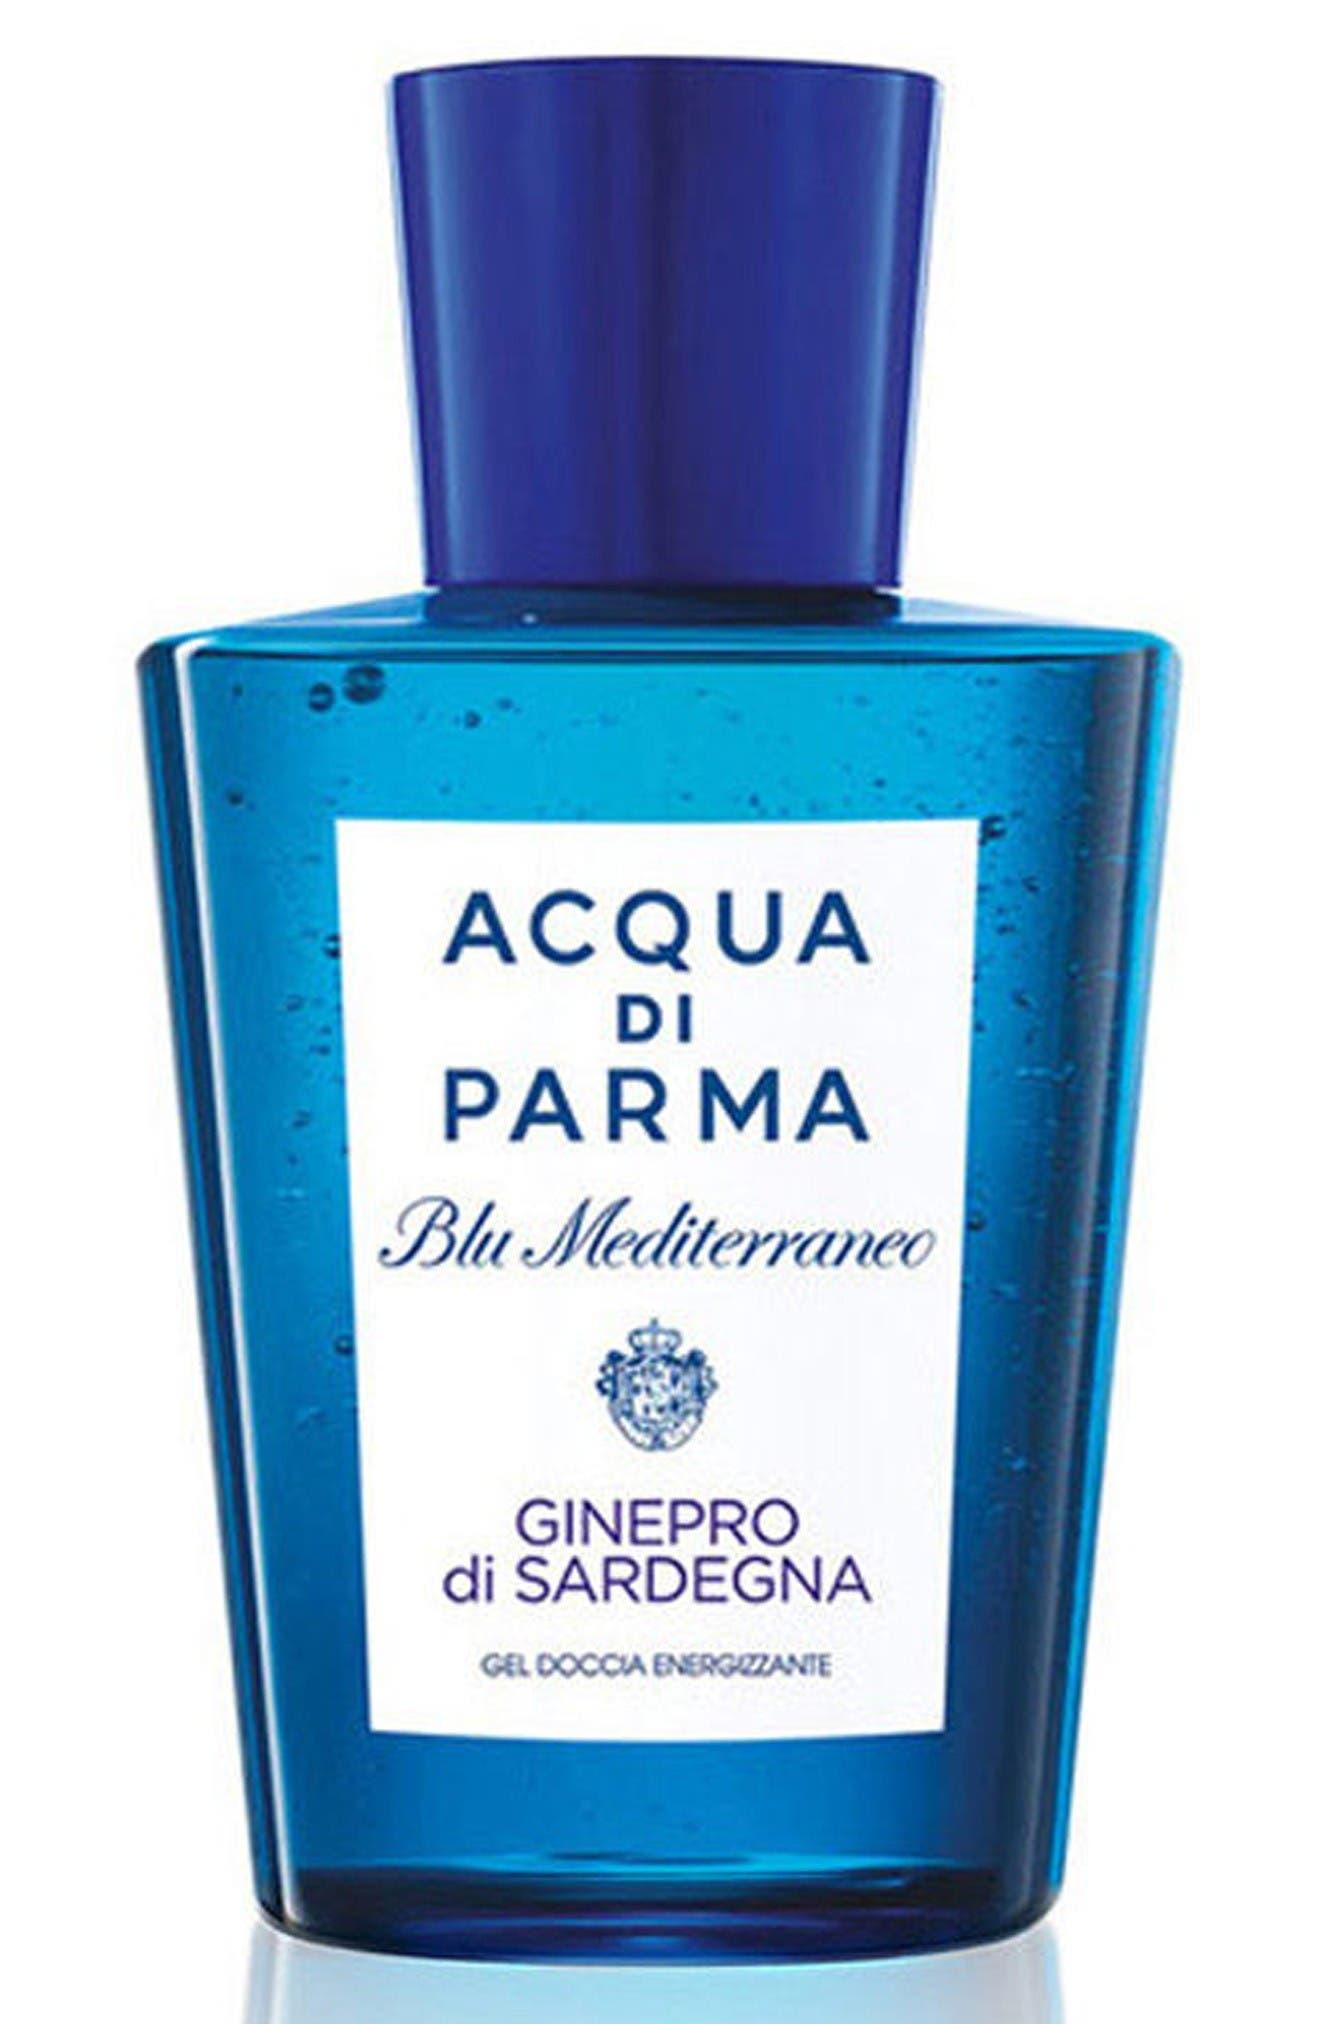 ACQUA DI PARMA 'Blu Mediterraneo - Ginepro di